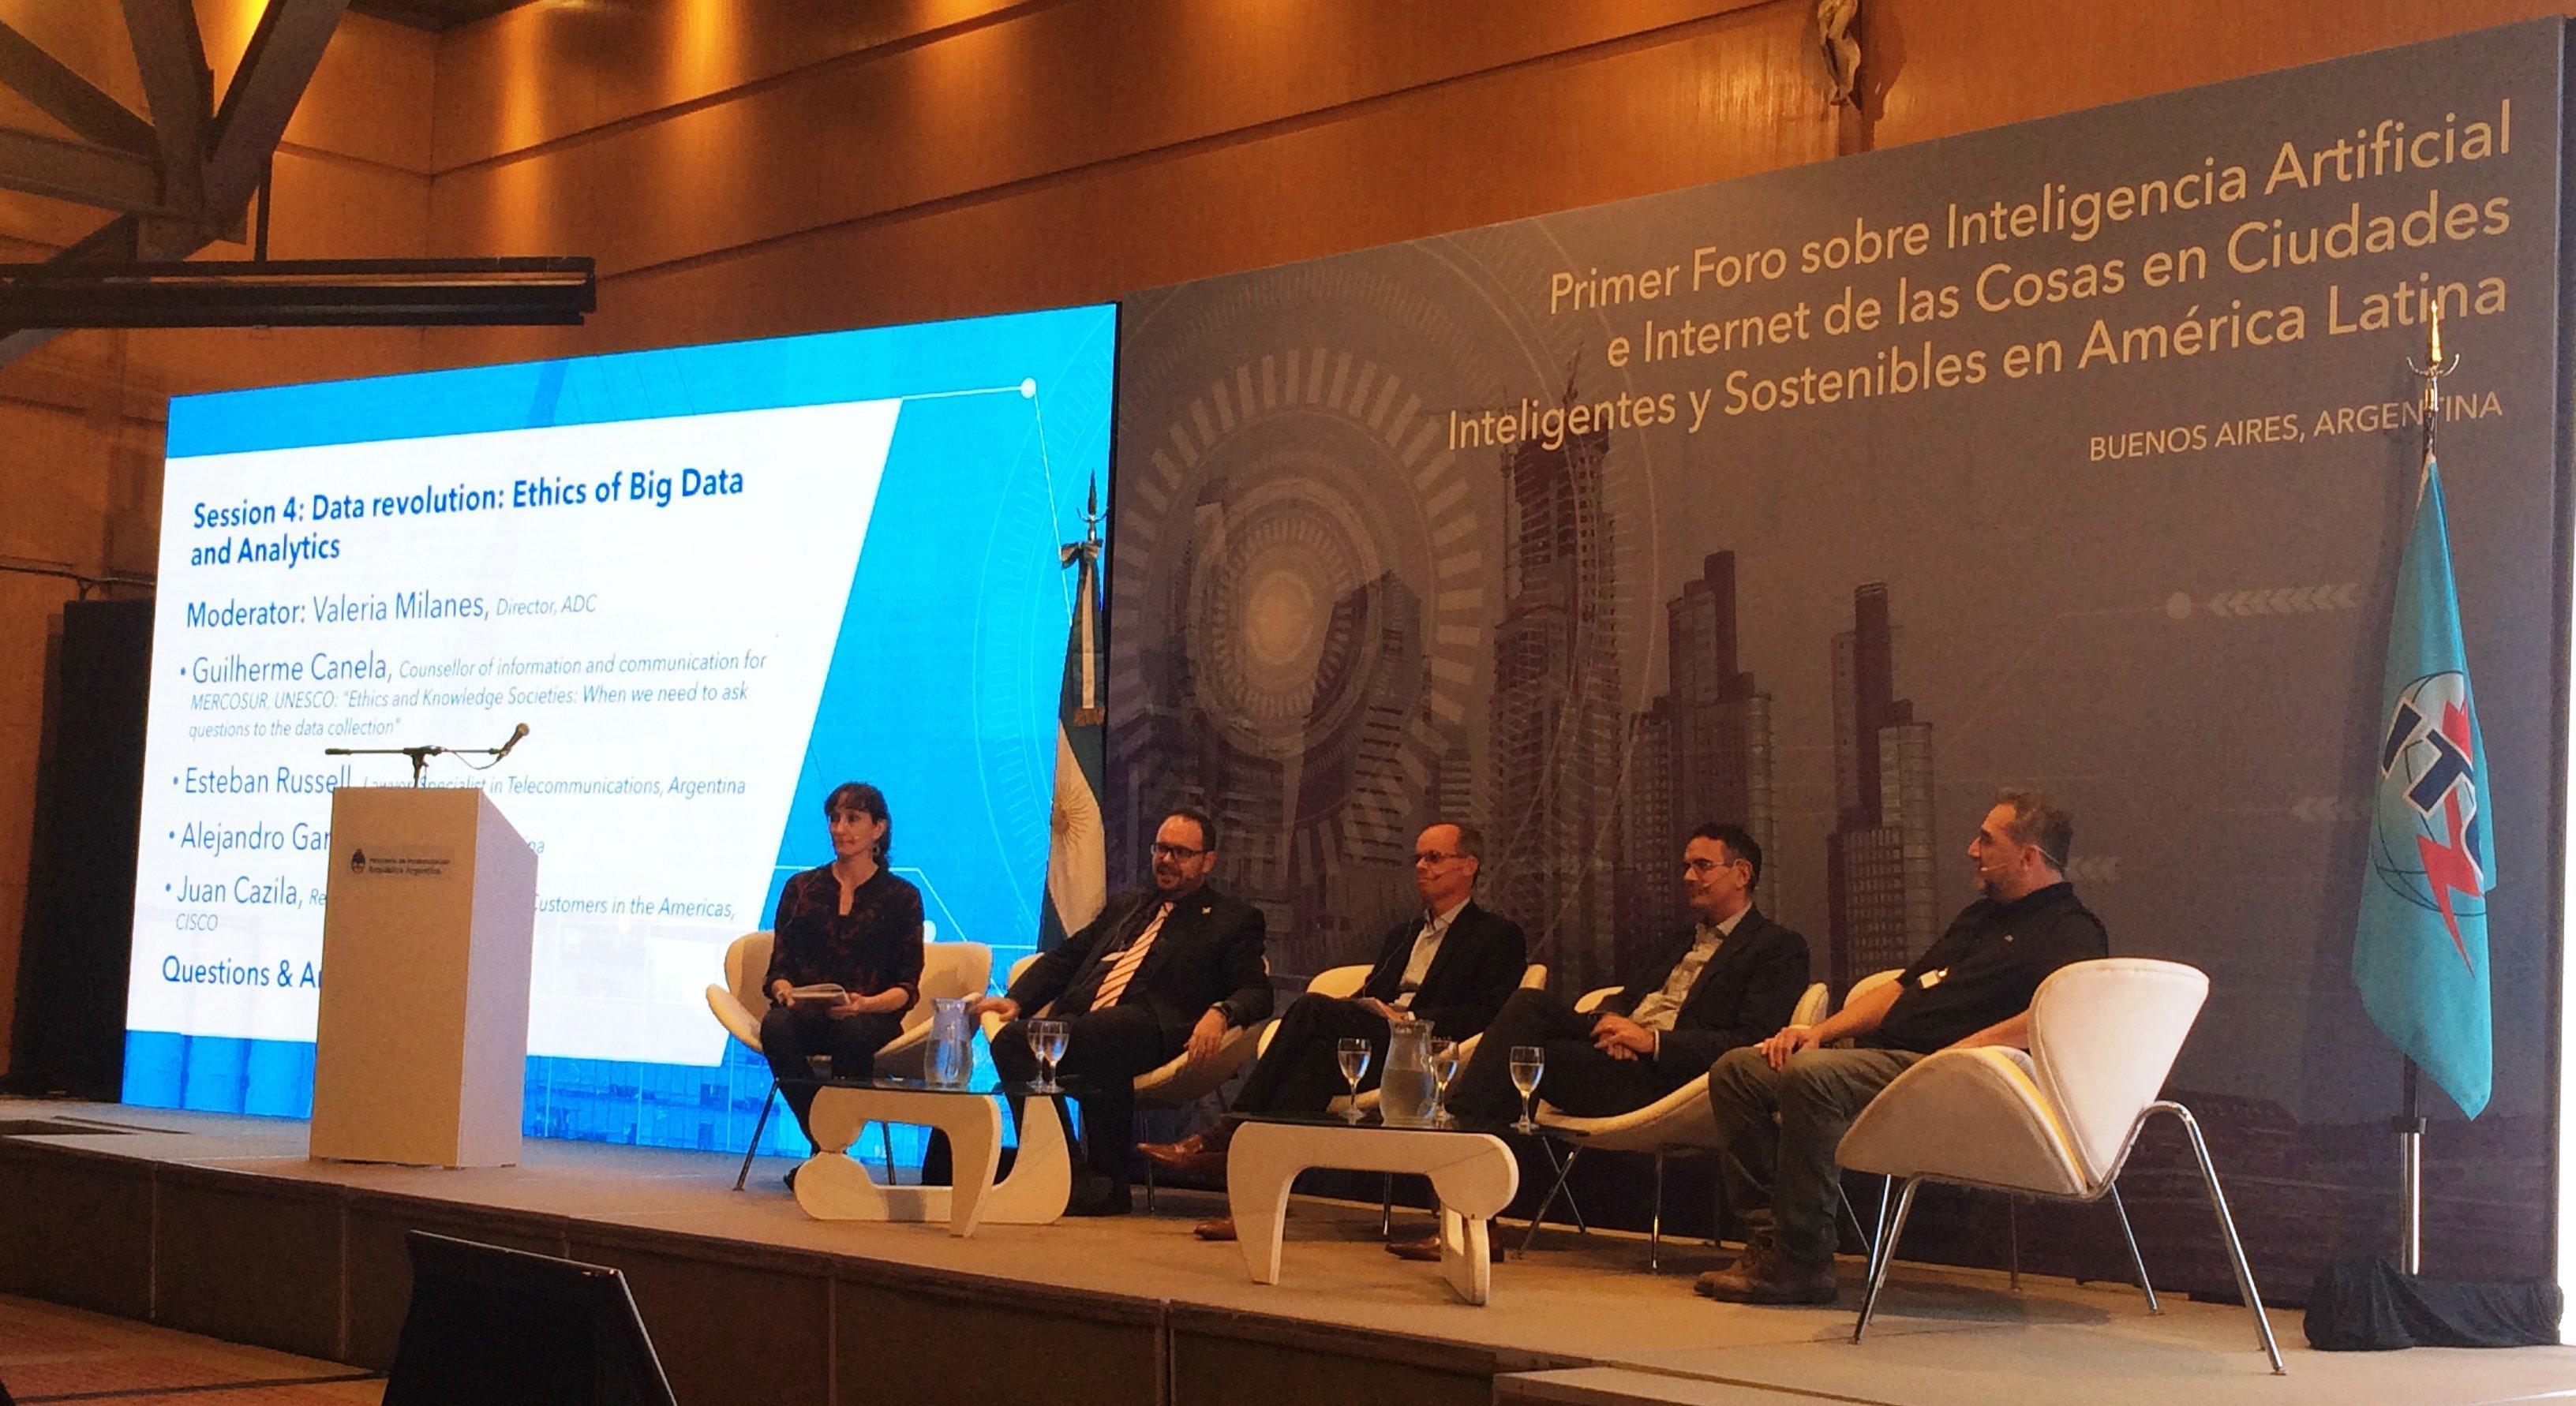 Primer Foro sobre Inteligencia Artificial e Internet de las Cosas en Ciudades Inteligentes sostenibles en América Latina  (Buenos Aires, Argentina)